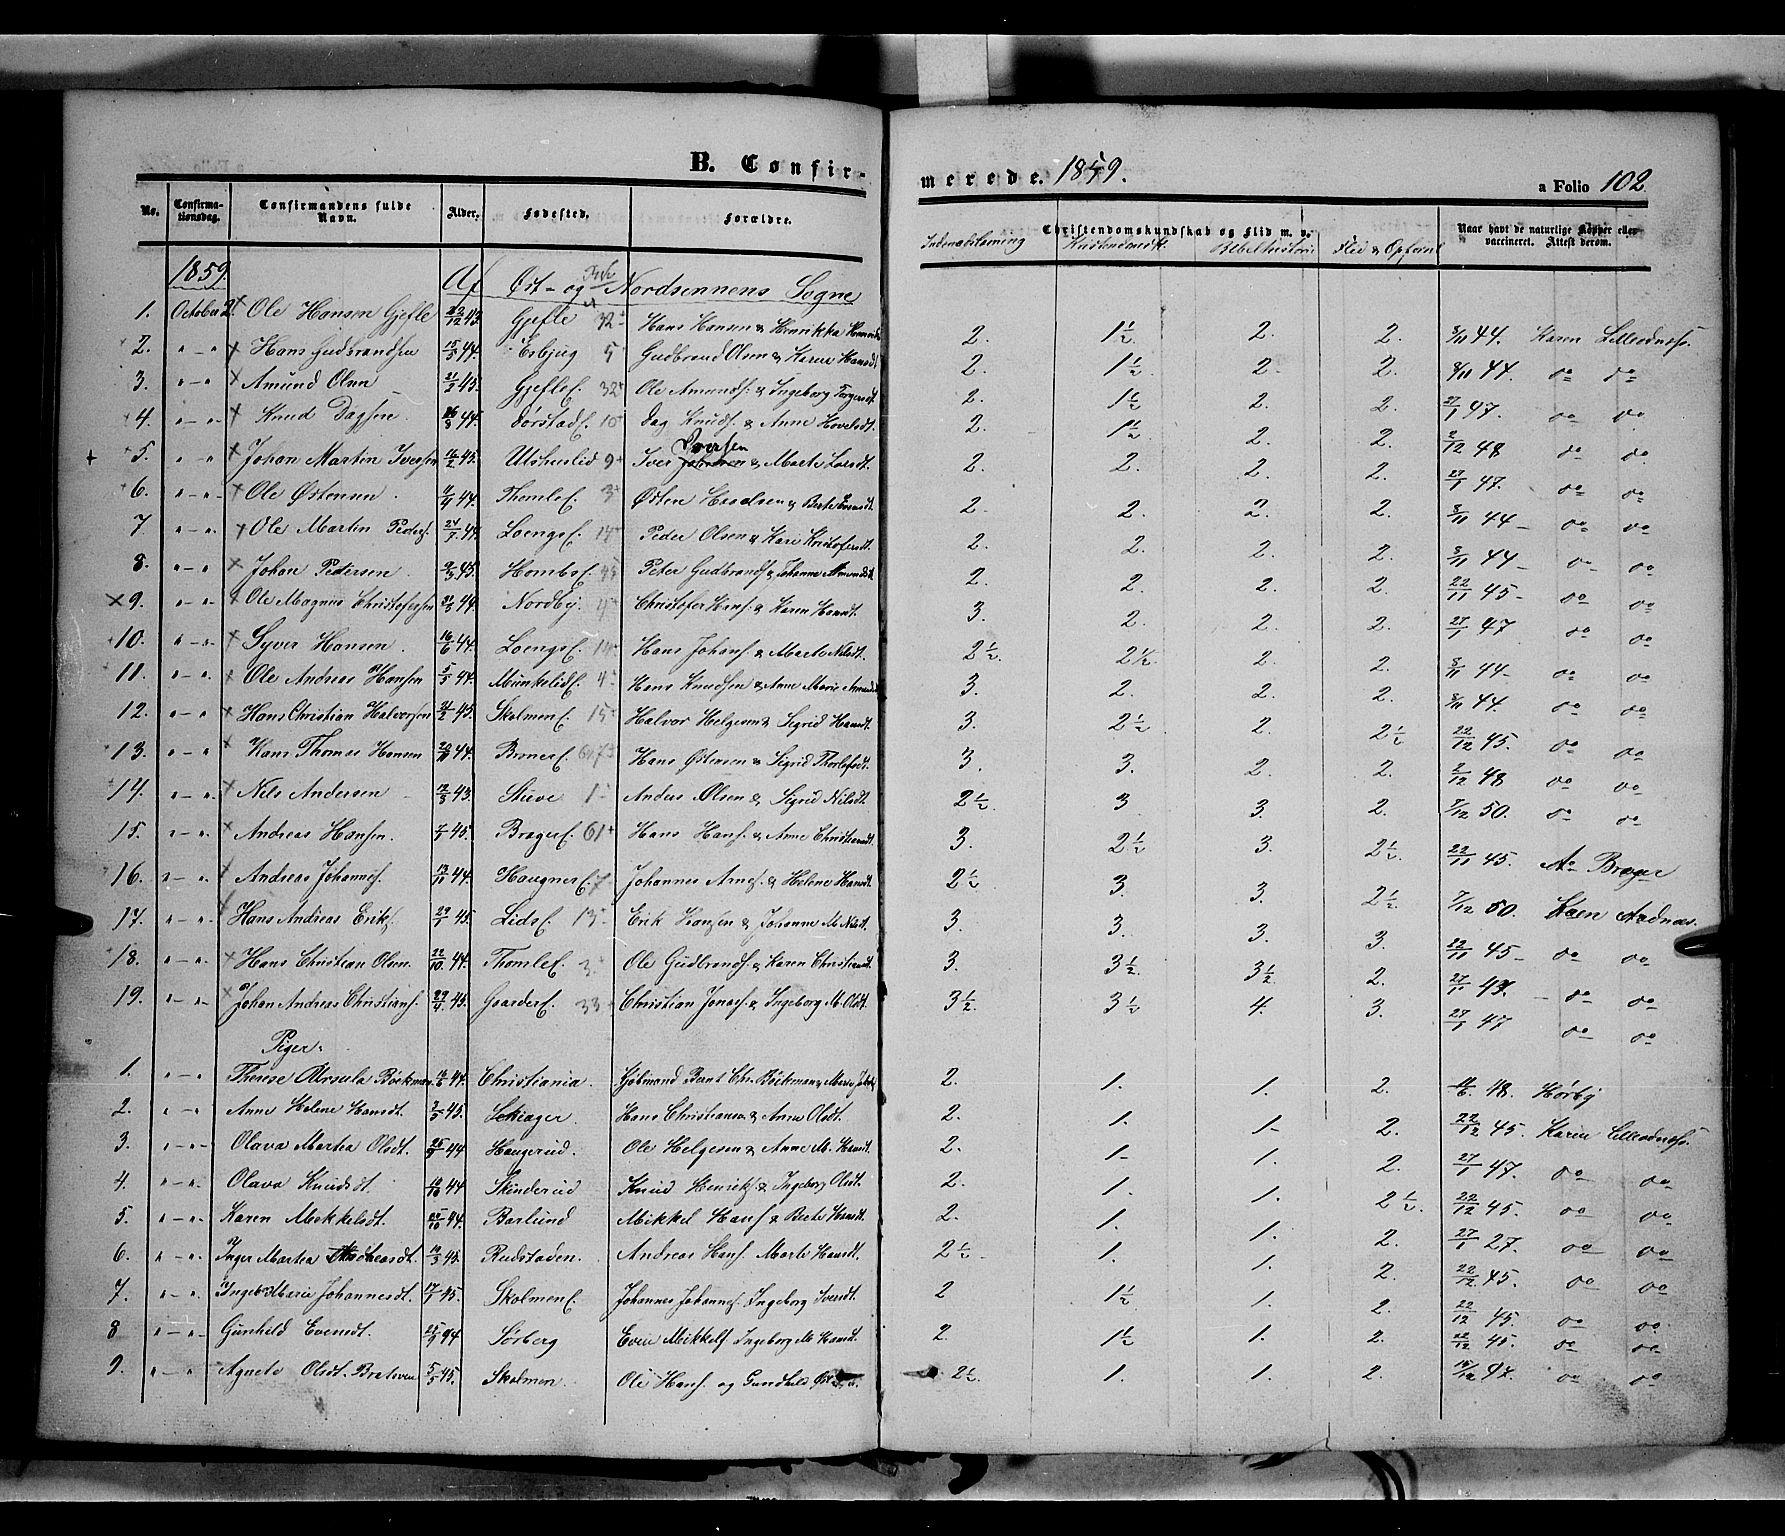 SAH, Land prestekontor, Ministerialbok nr. 10, 1847-1859, s. 102